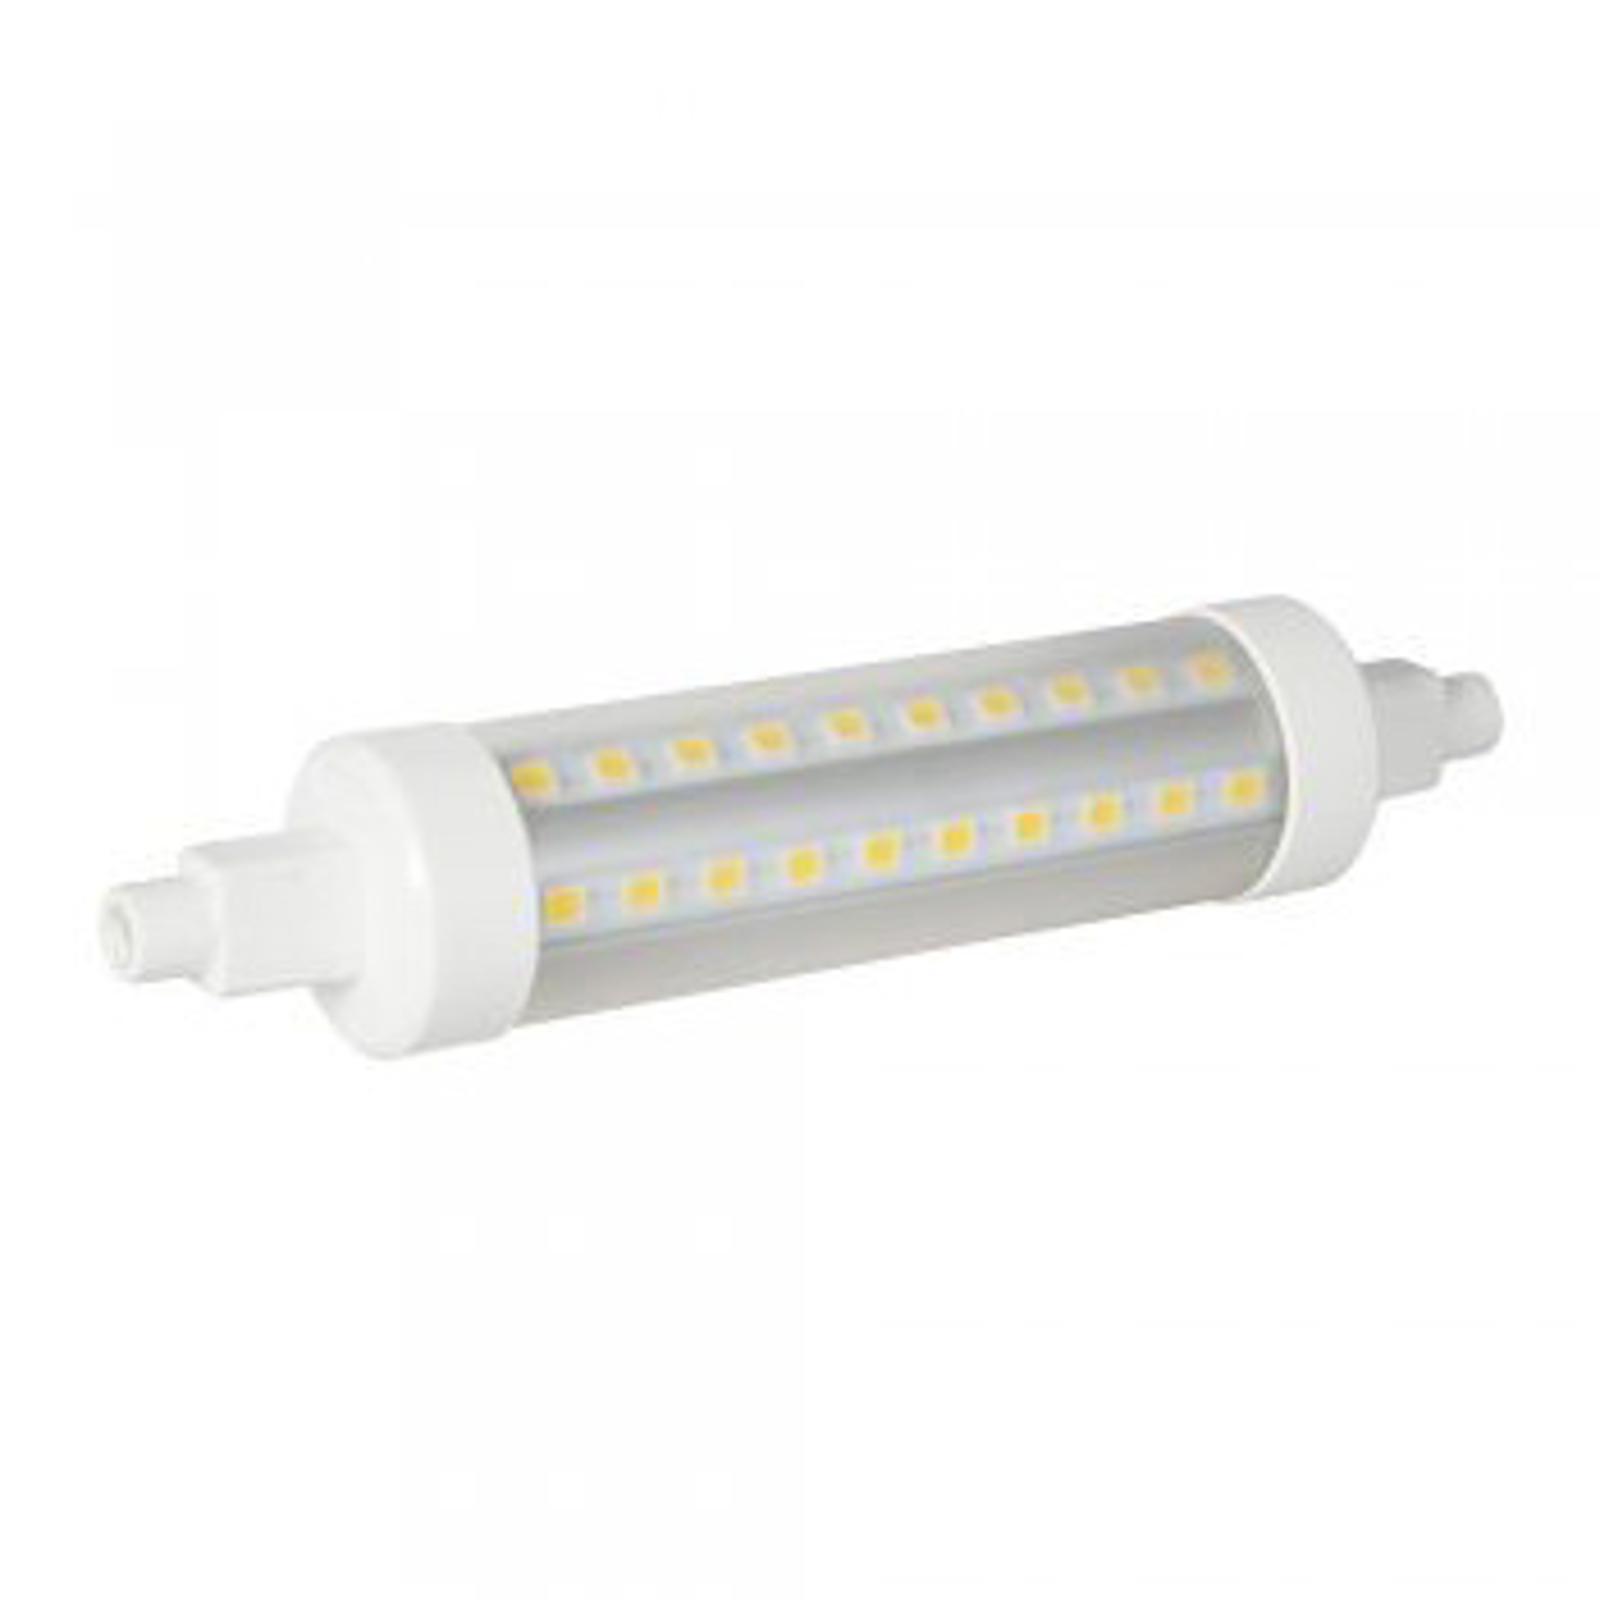 R7s 8 W 827 LED-valaisin VEO putkimalli